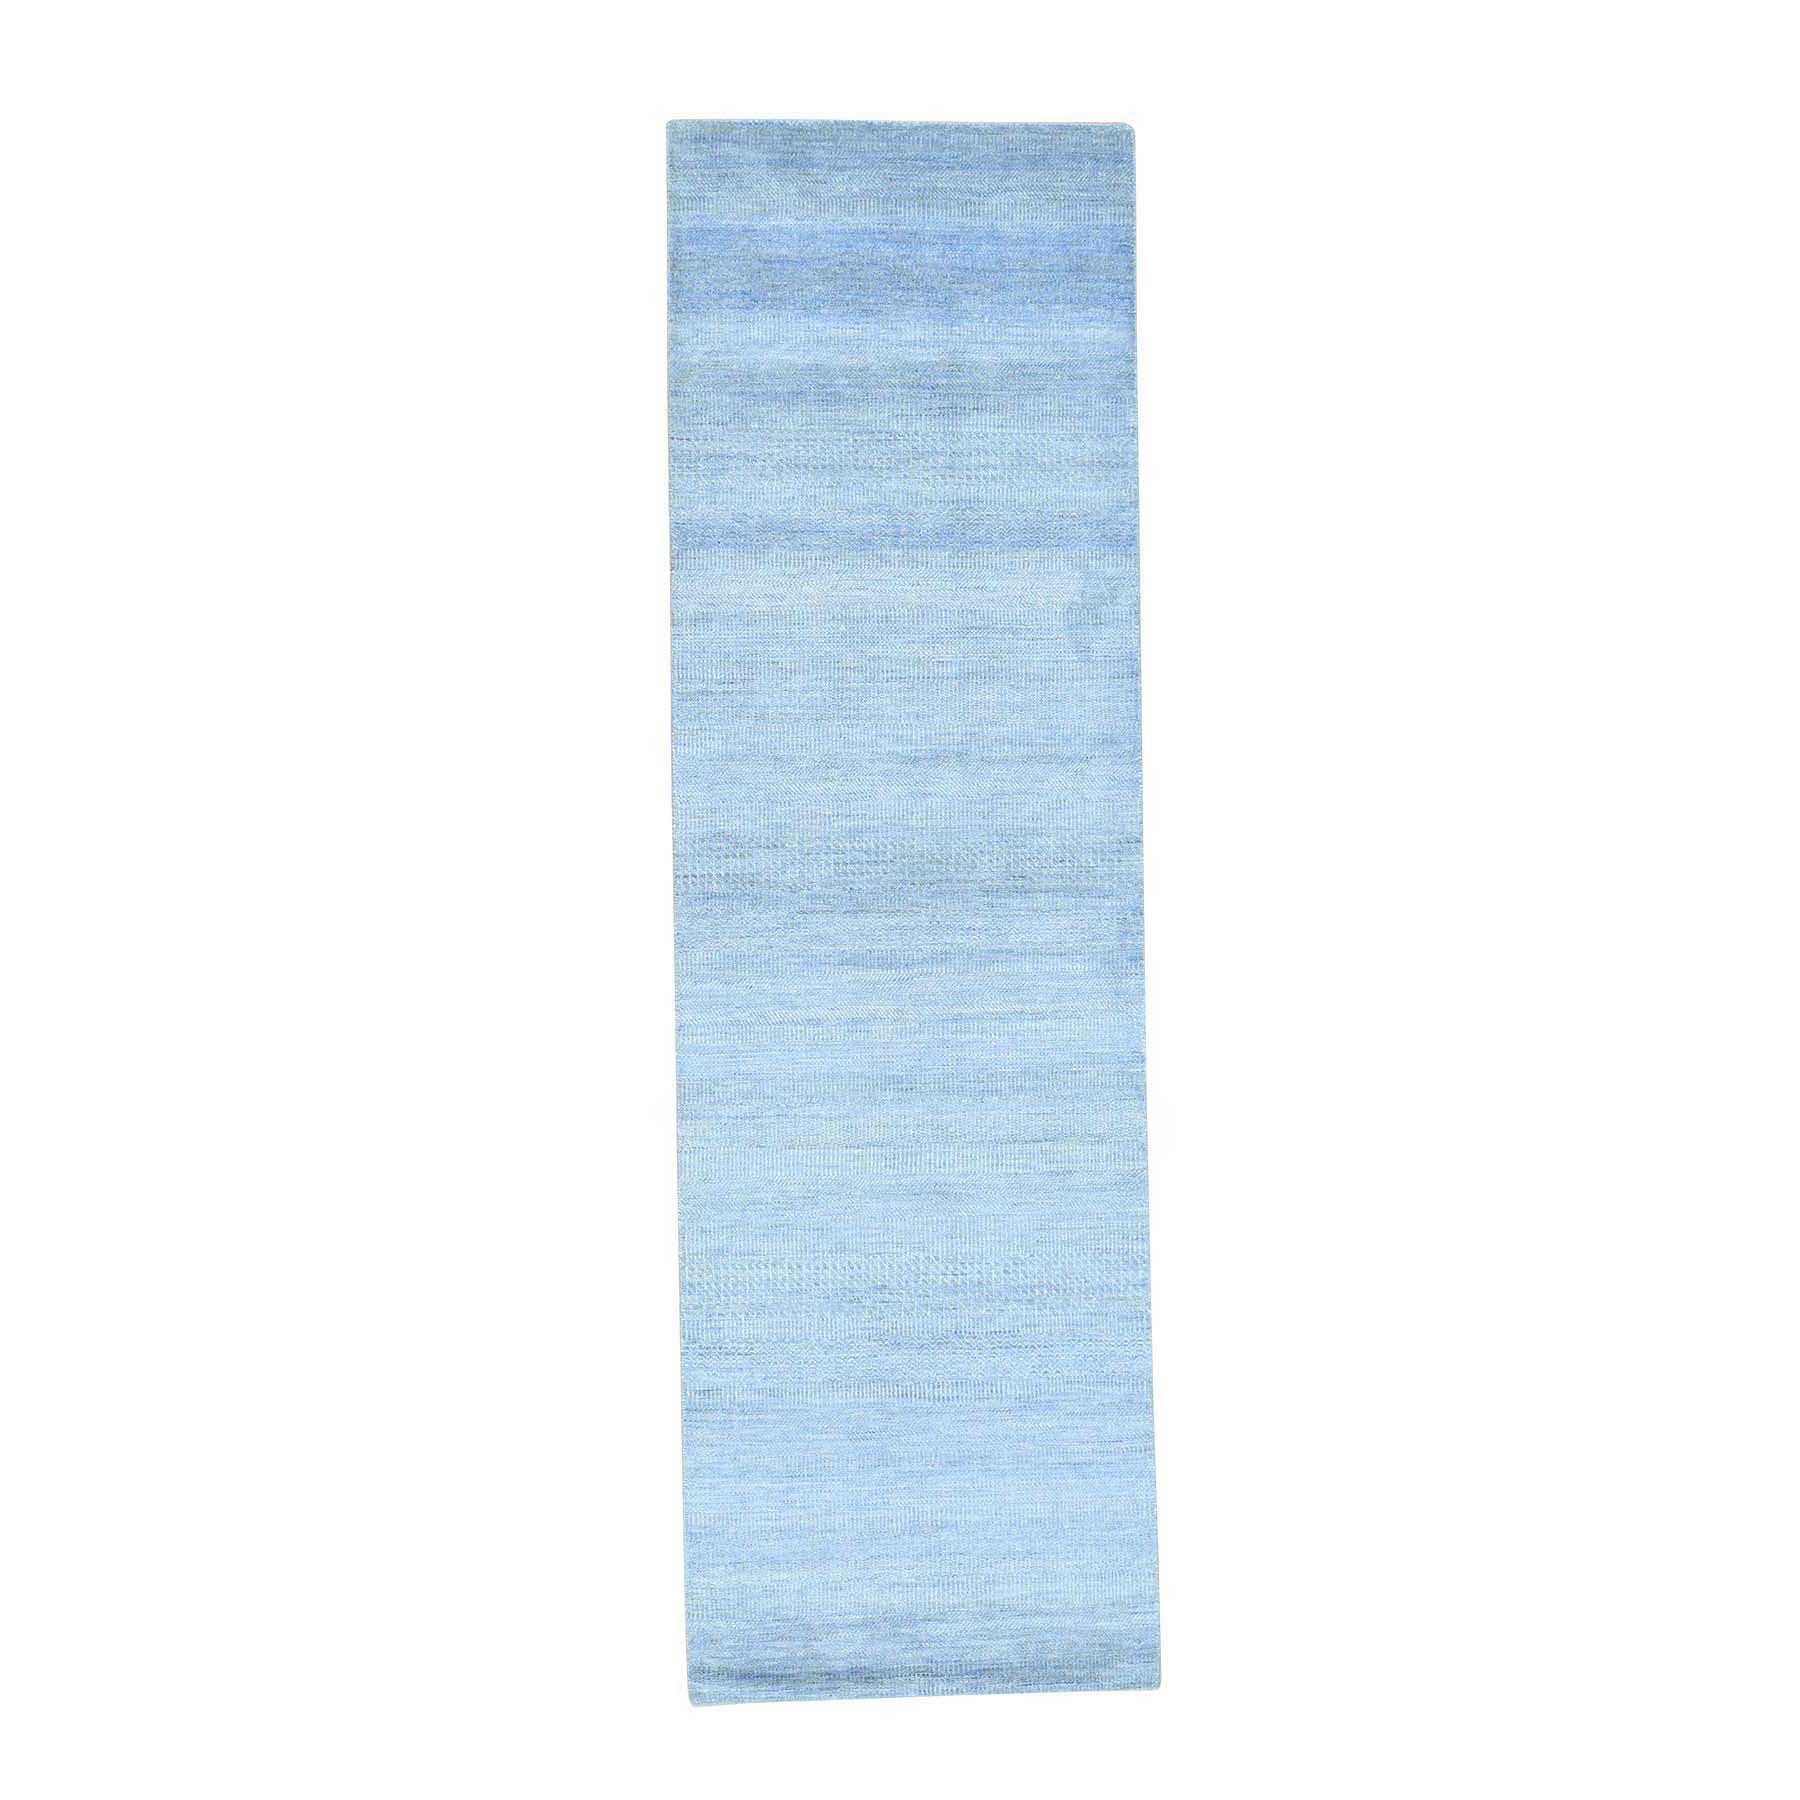 "3'X9'10"" Hand-Knotted Modern Grass Design Wool And Silk Runner Rug moacecaa"